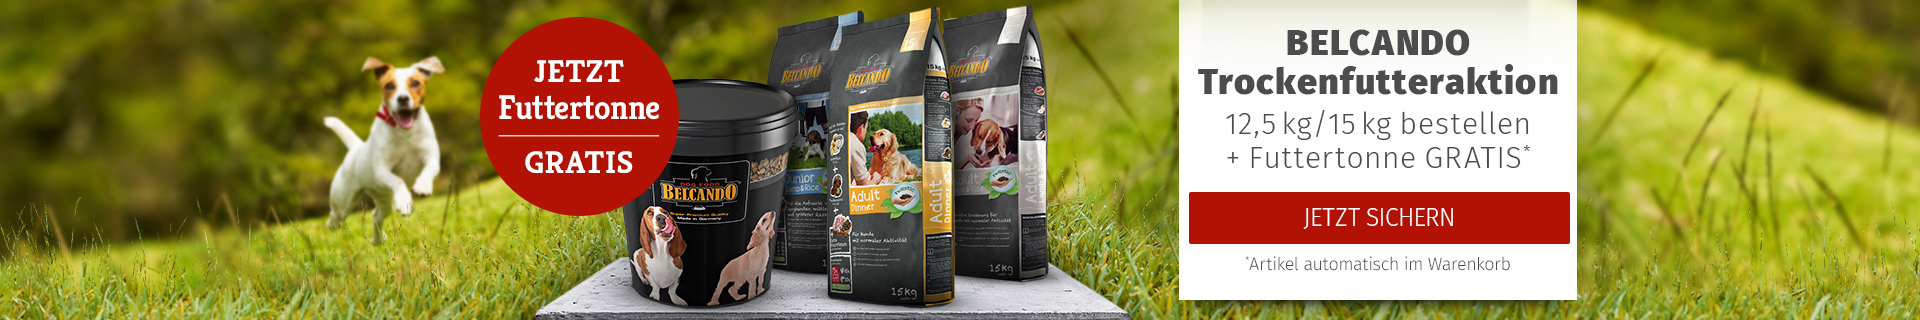 Belcando Aktion 12,5/15kg bestellen + Futtertonne gratis